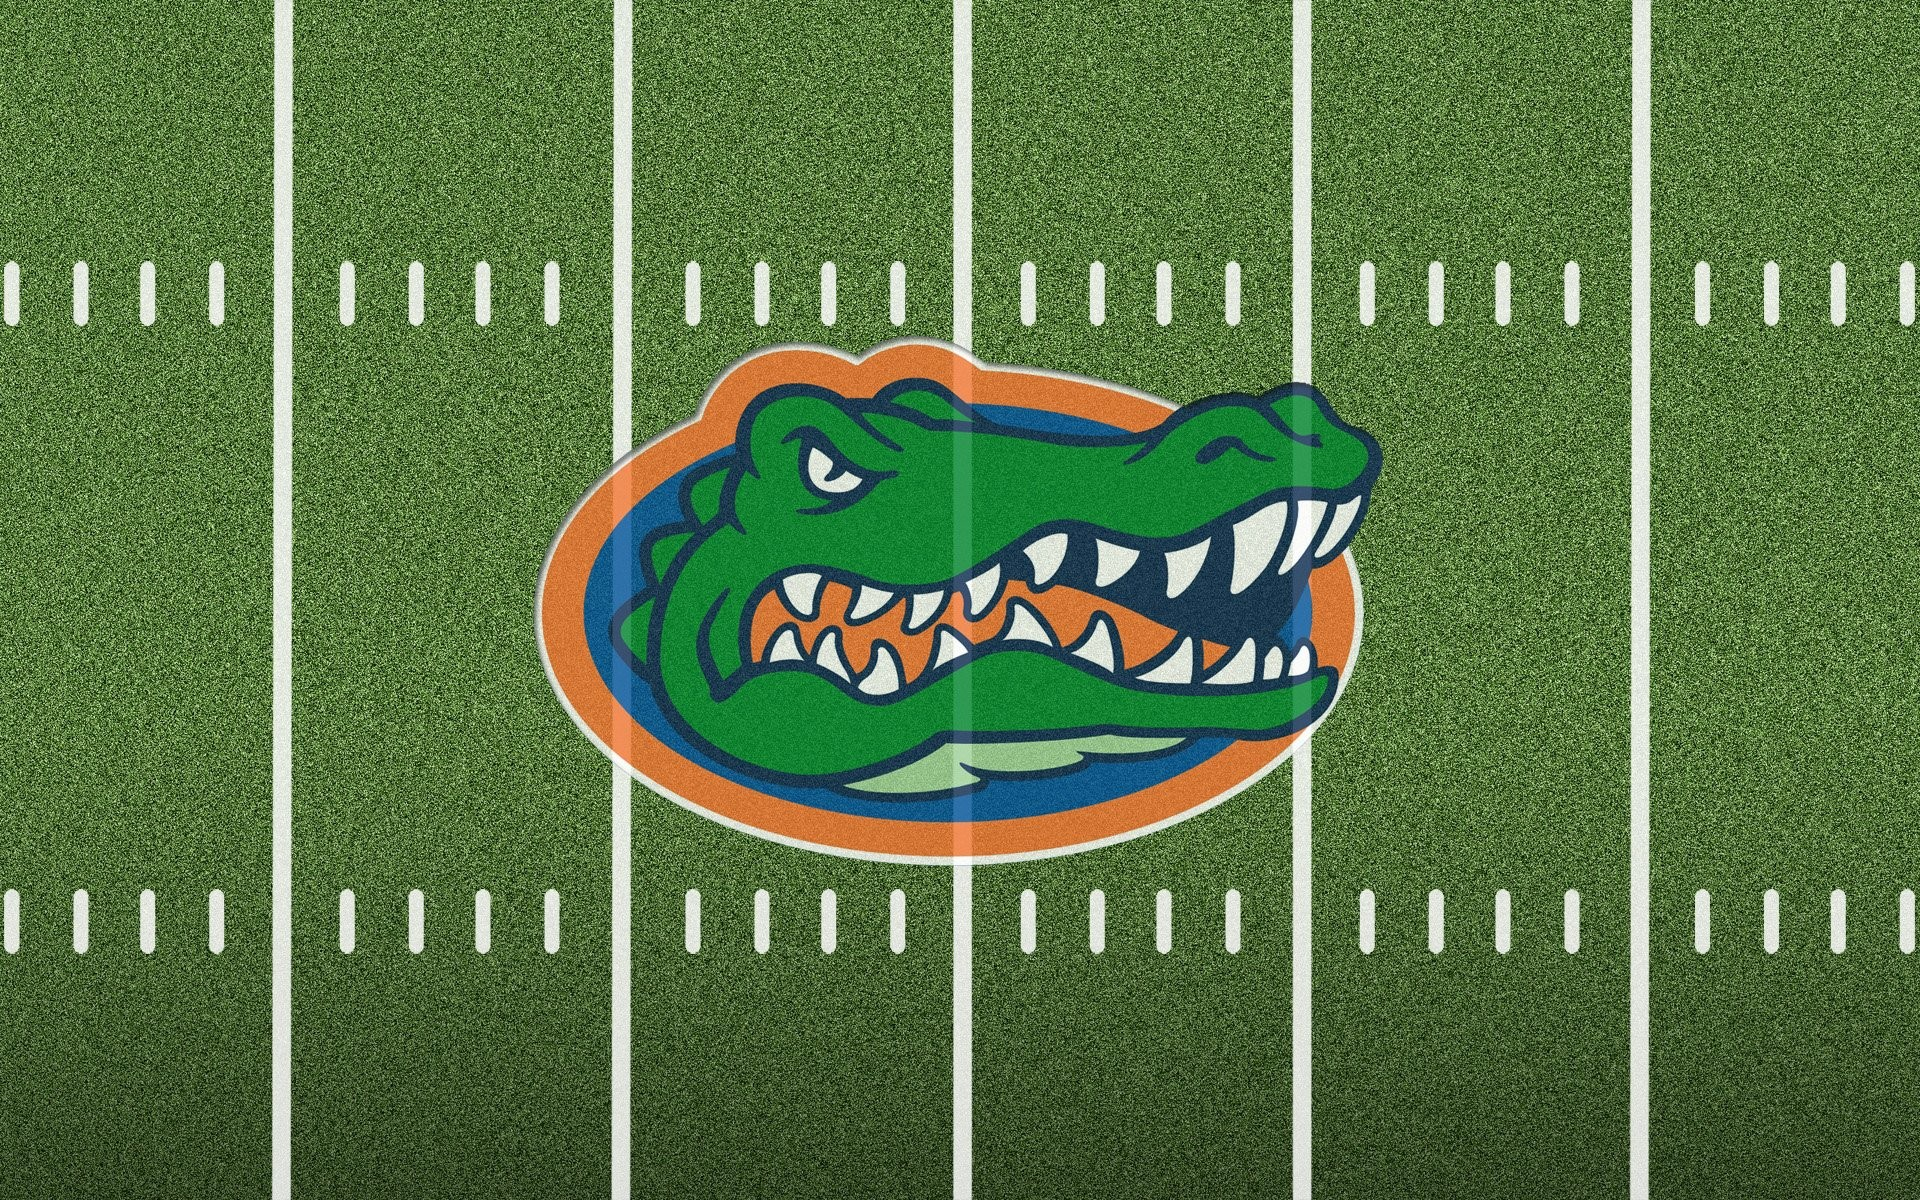 Florida gators football wallpapers wallpapertag - Florida gators background ...